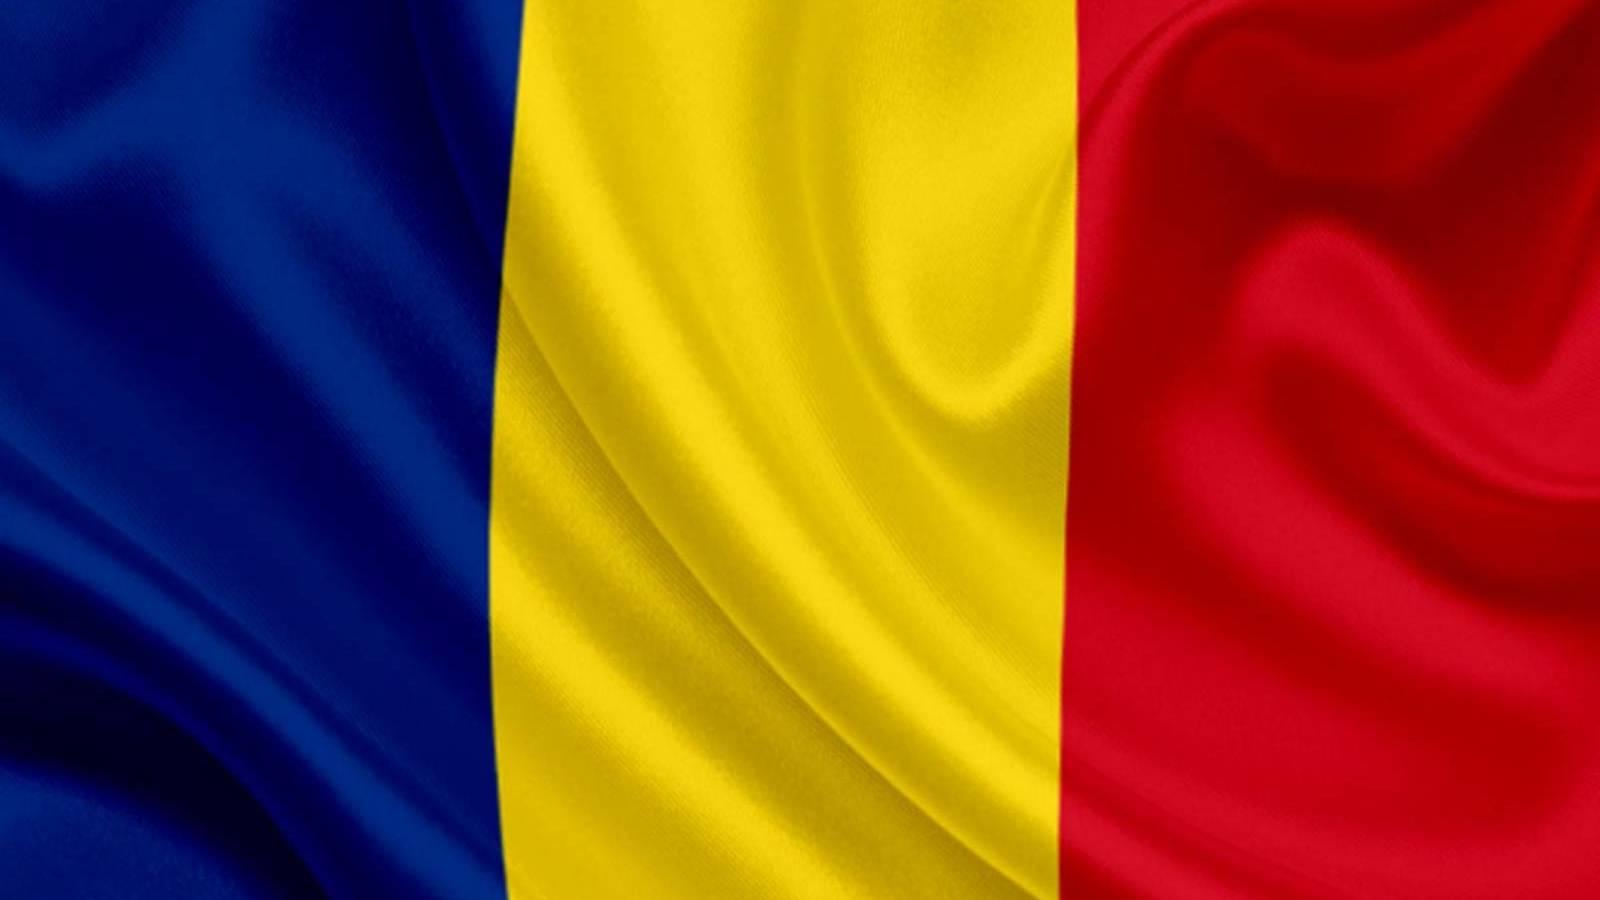 Romania Evolutia Grava Valul 4 Restrictiile Reimpuse